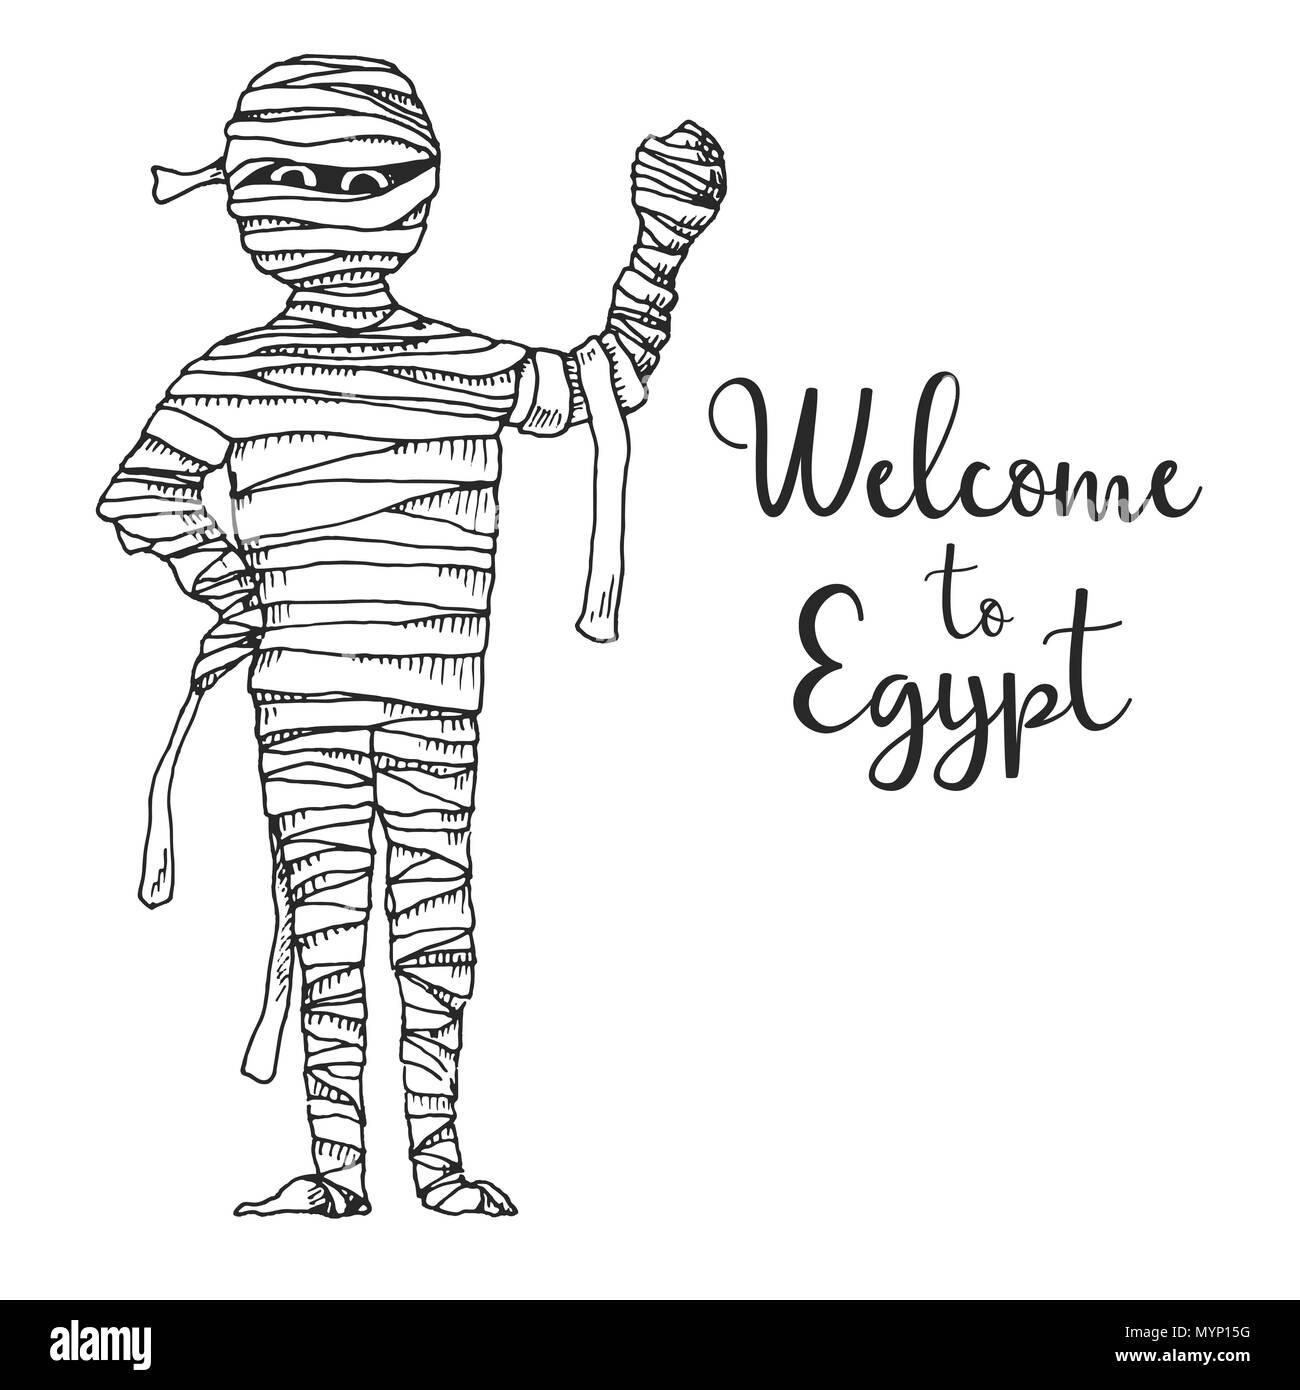 874c09d69 Boceto cartoon momia. Ilustración vectorial. Texto Bienvenido a Egipto.  Imagen De Stock